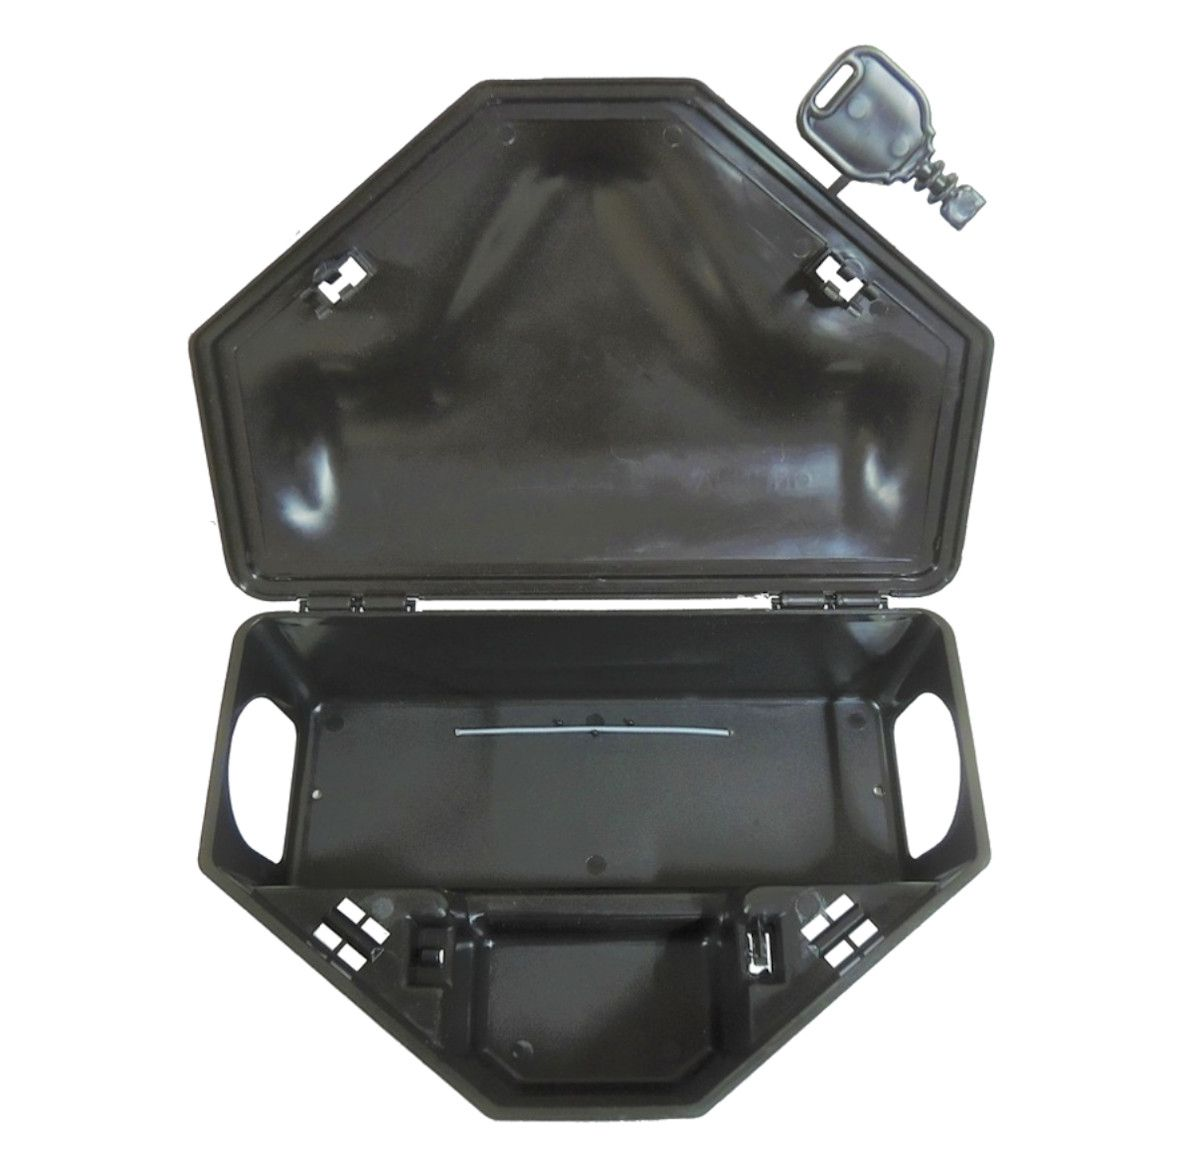 Kit 59 Porta Isca C/2 Chaves + 59 Bloco Extrusado Mata Seca